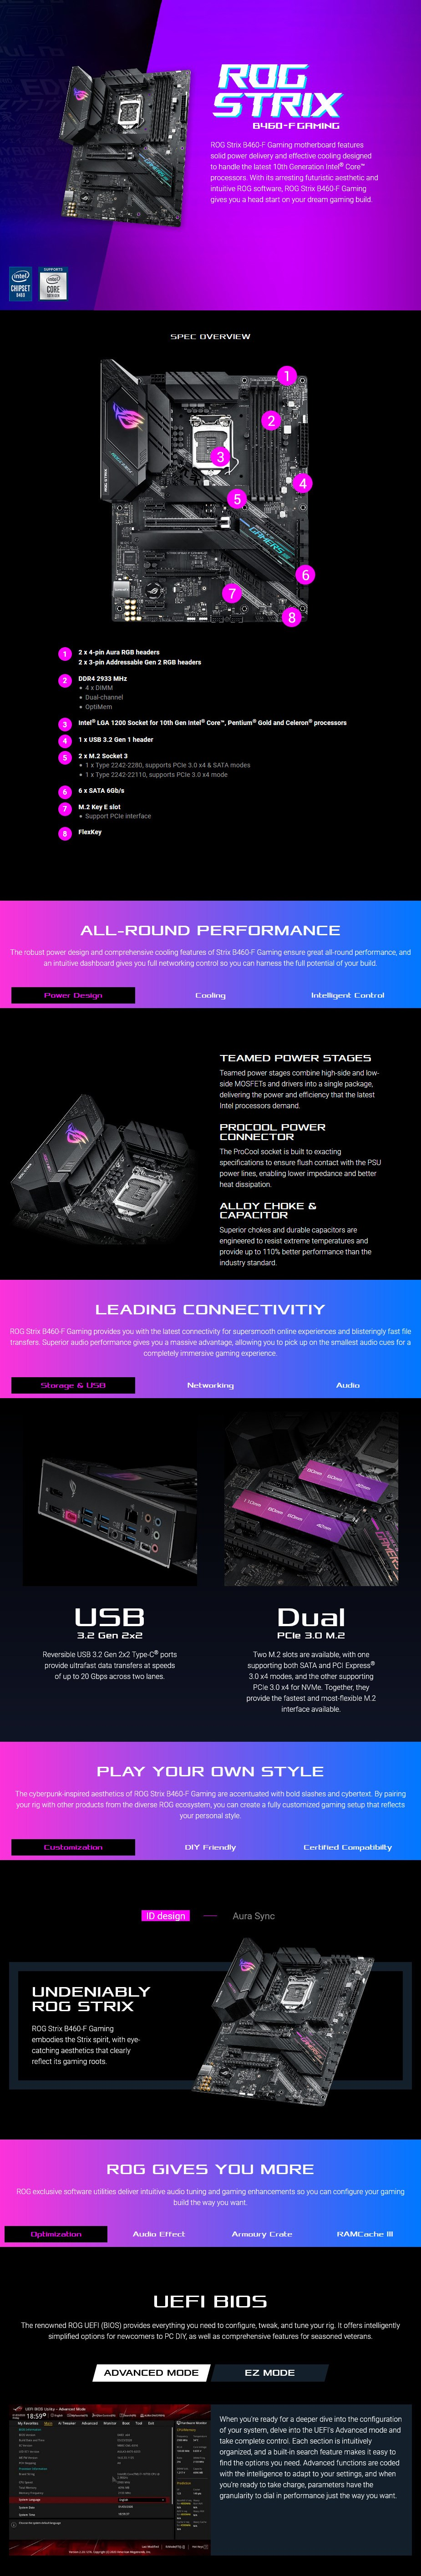 ASUS ROG STRIX B460-F GAMING LGA 1200 ATX Motherboard - Overview 1